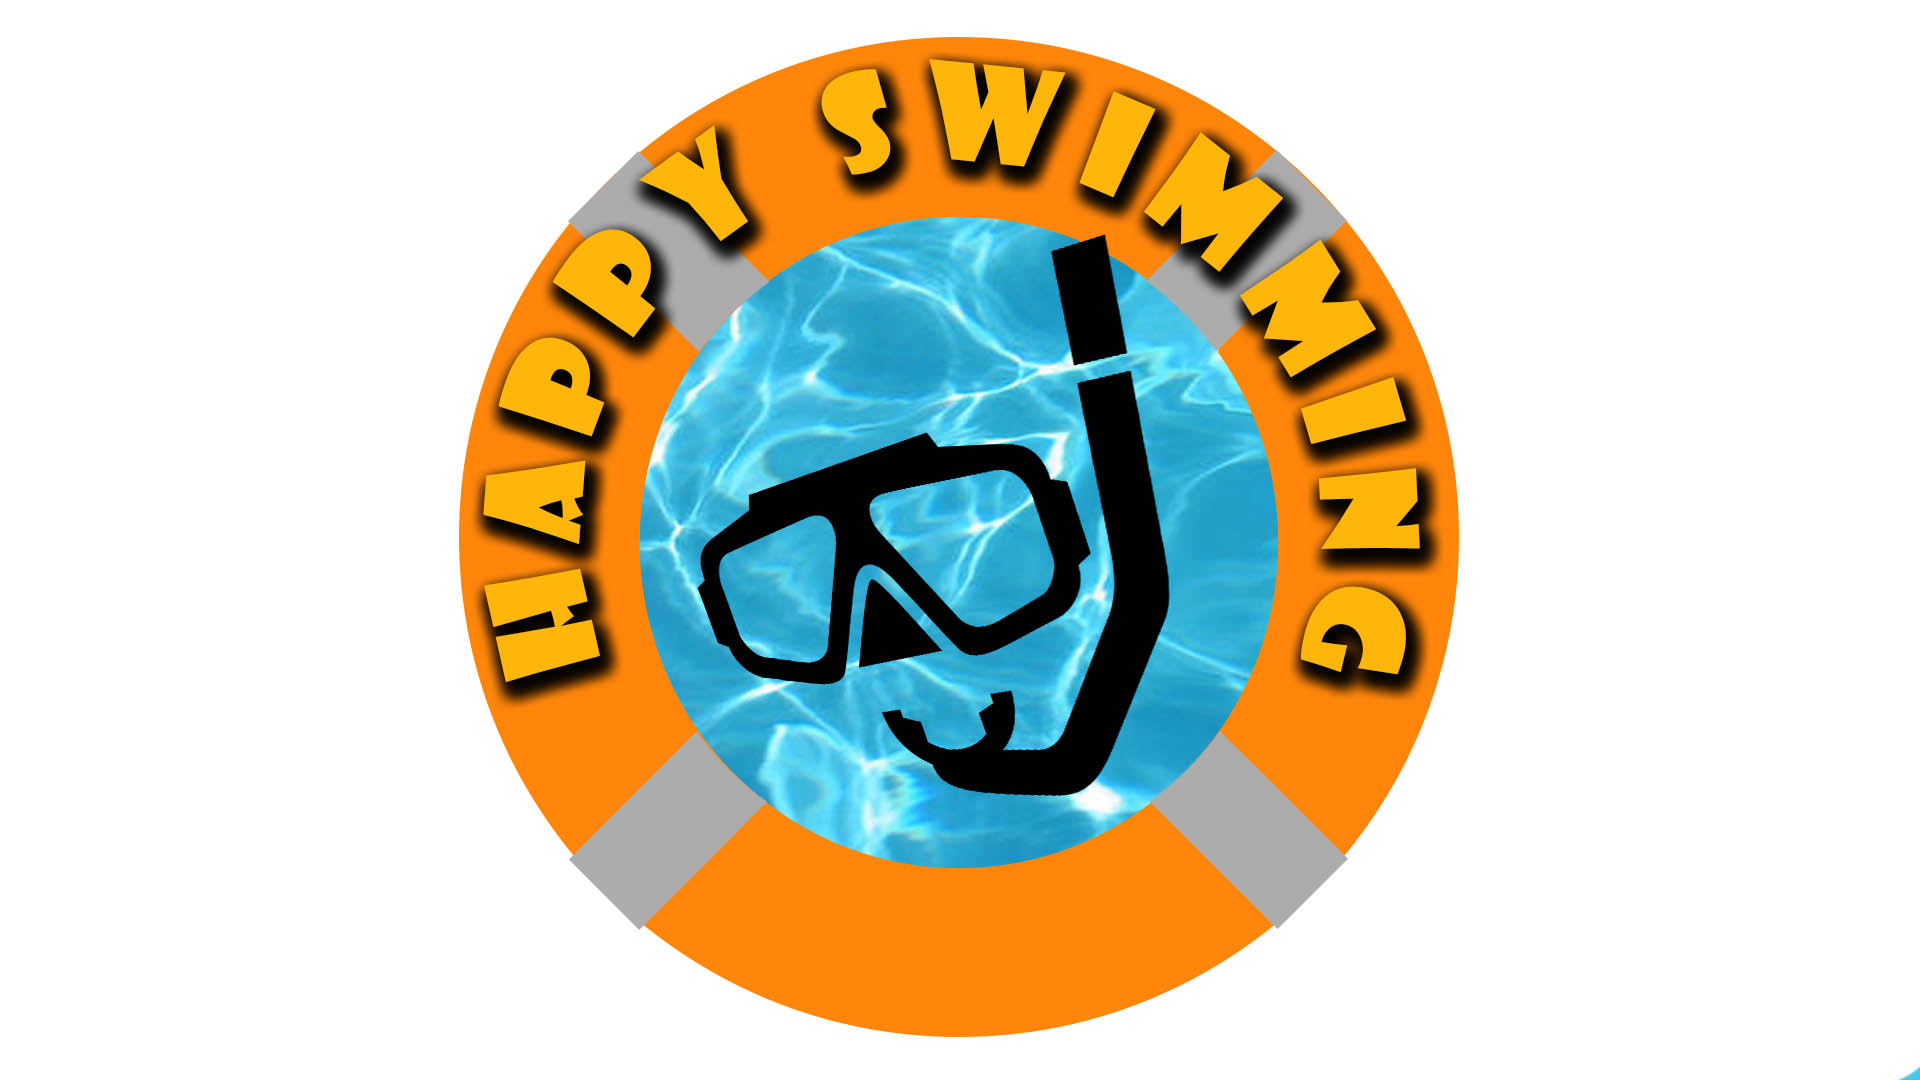 Логотип для  детского бассейна. фото f_1955c767a51f11e9.jpg